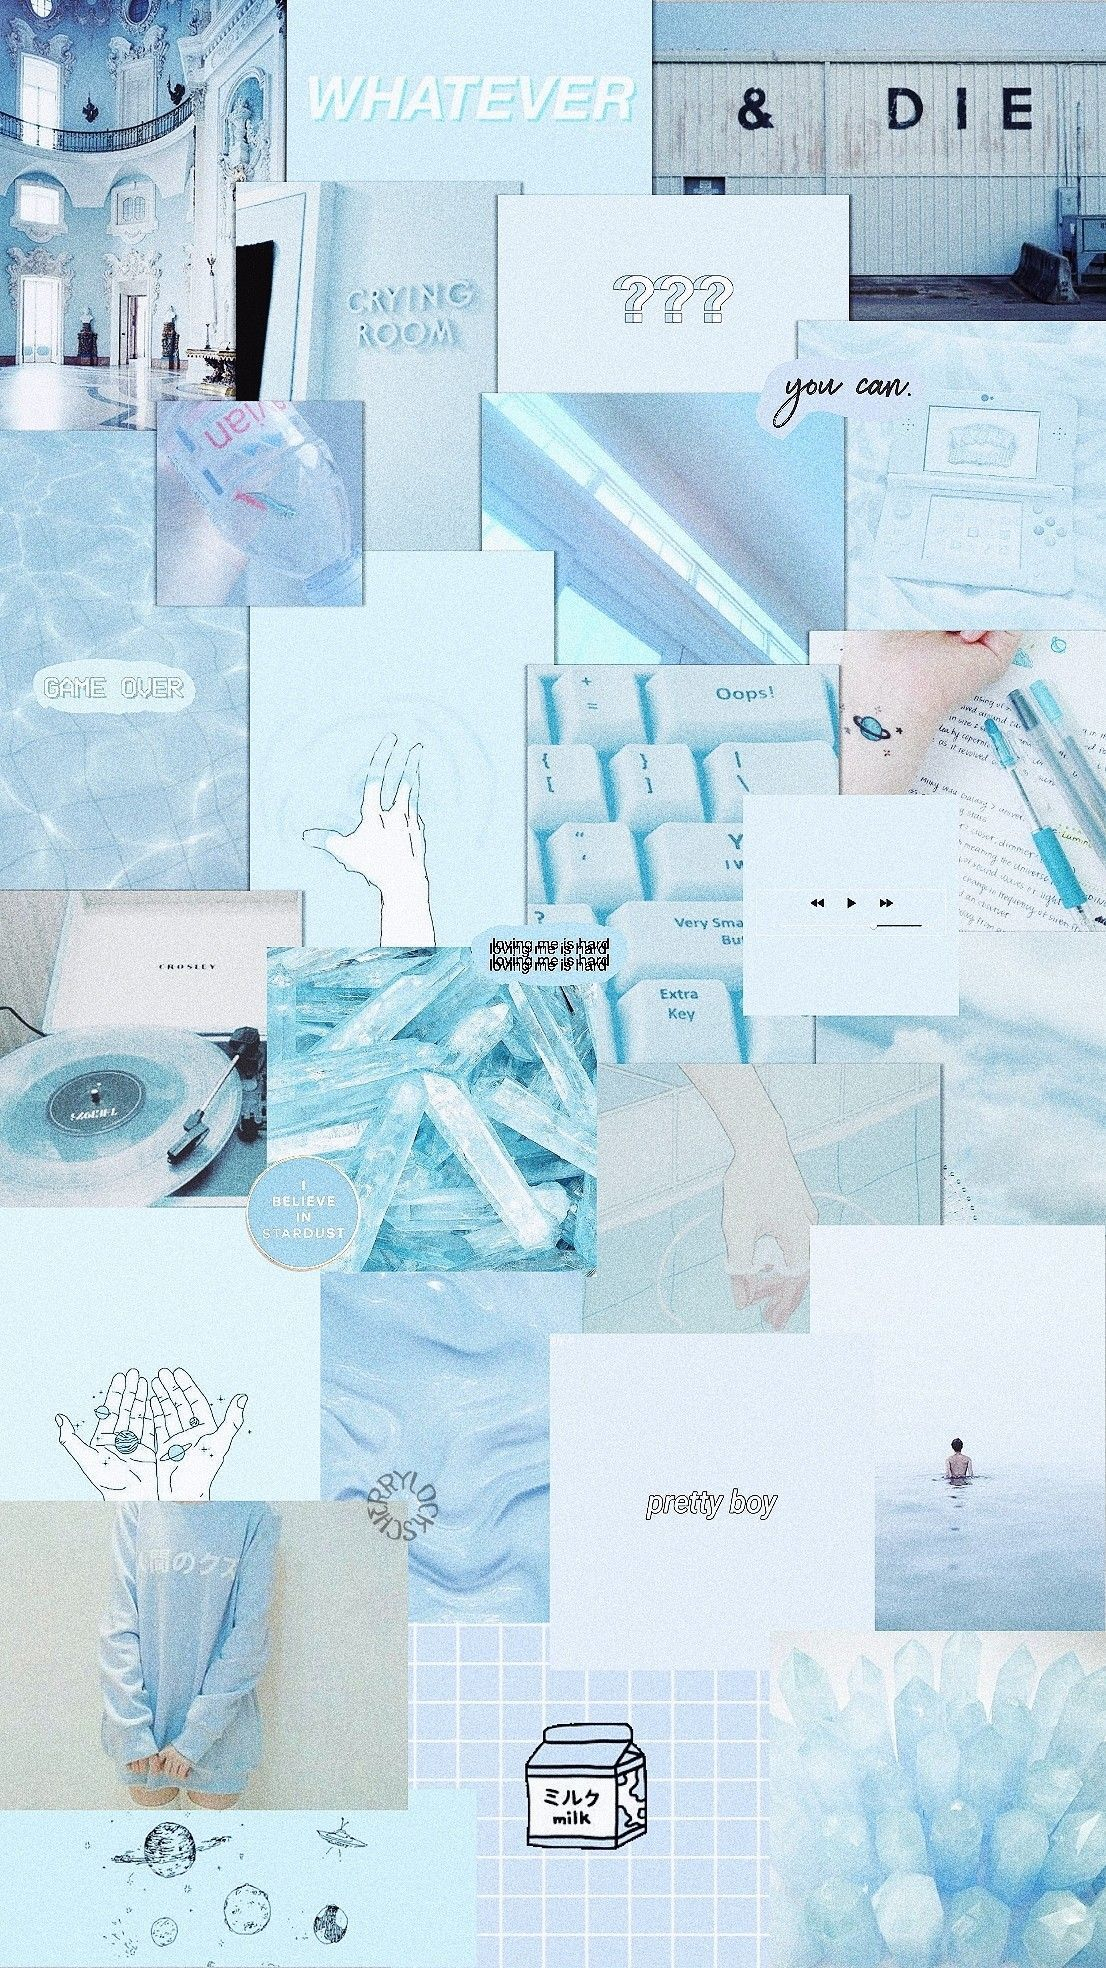 Wallpaper Pastel Blue Aesthetic : wallpaper, pastel, aesthetic, Aesthetic, Wallpapers, WallpaperDog